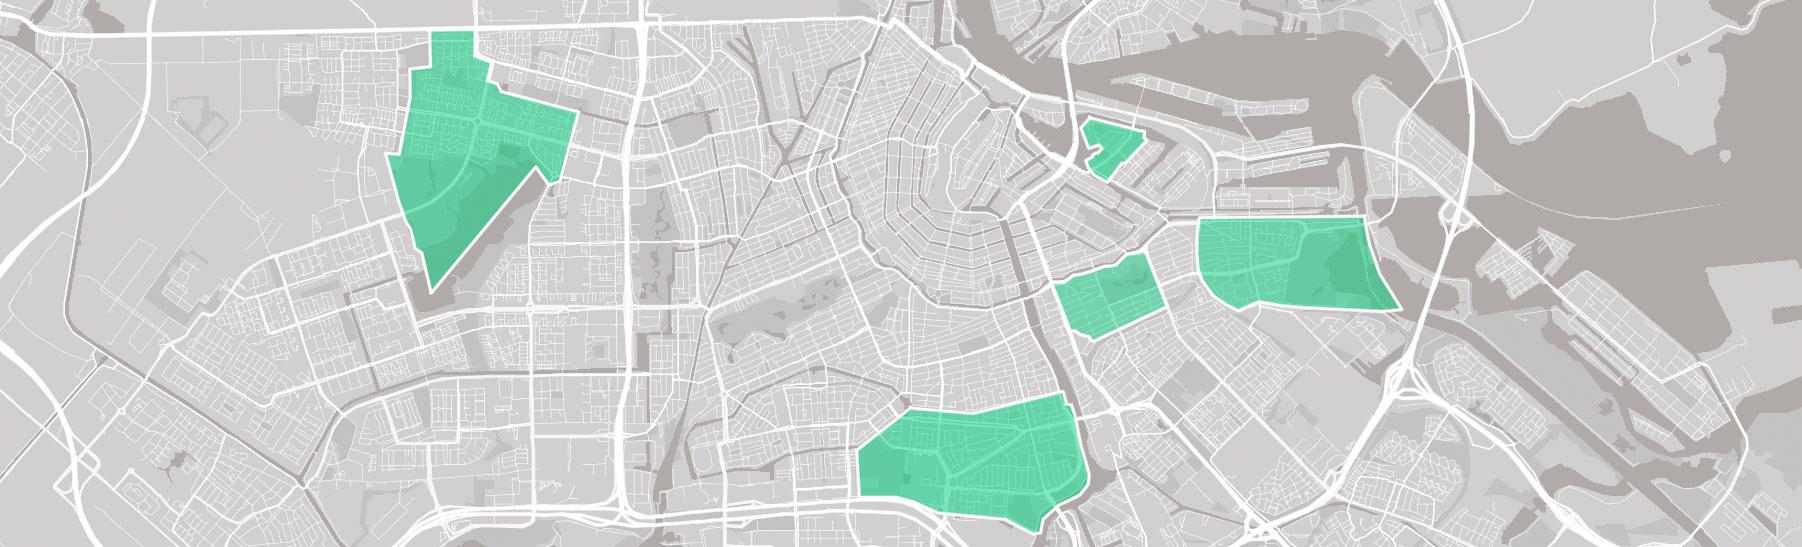 RESILIO - Blauw-groene daken - Plattegrond